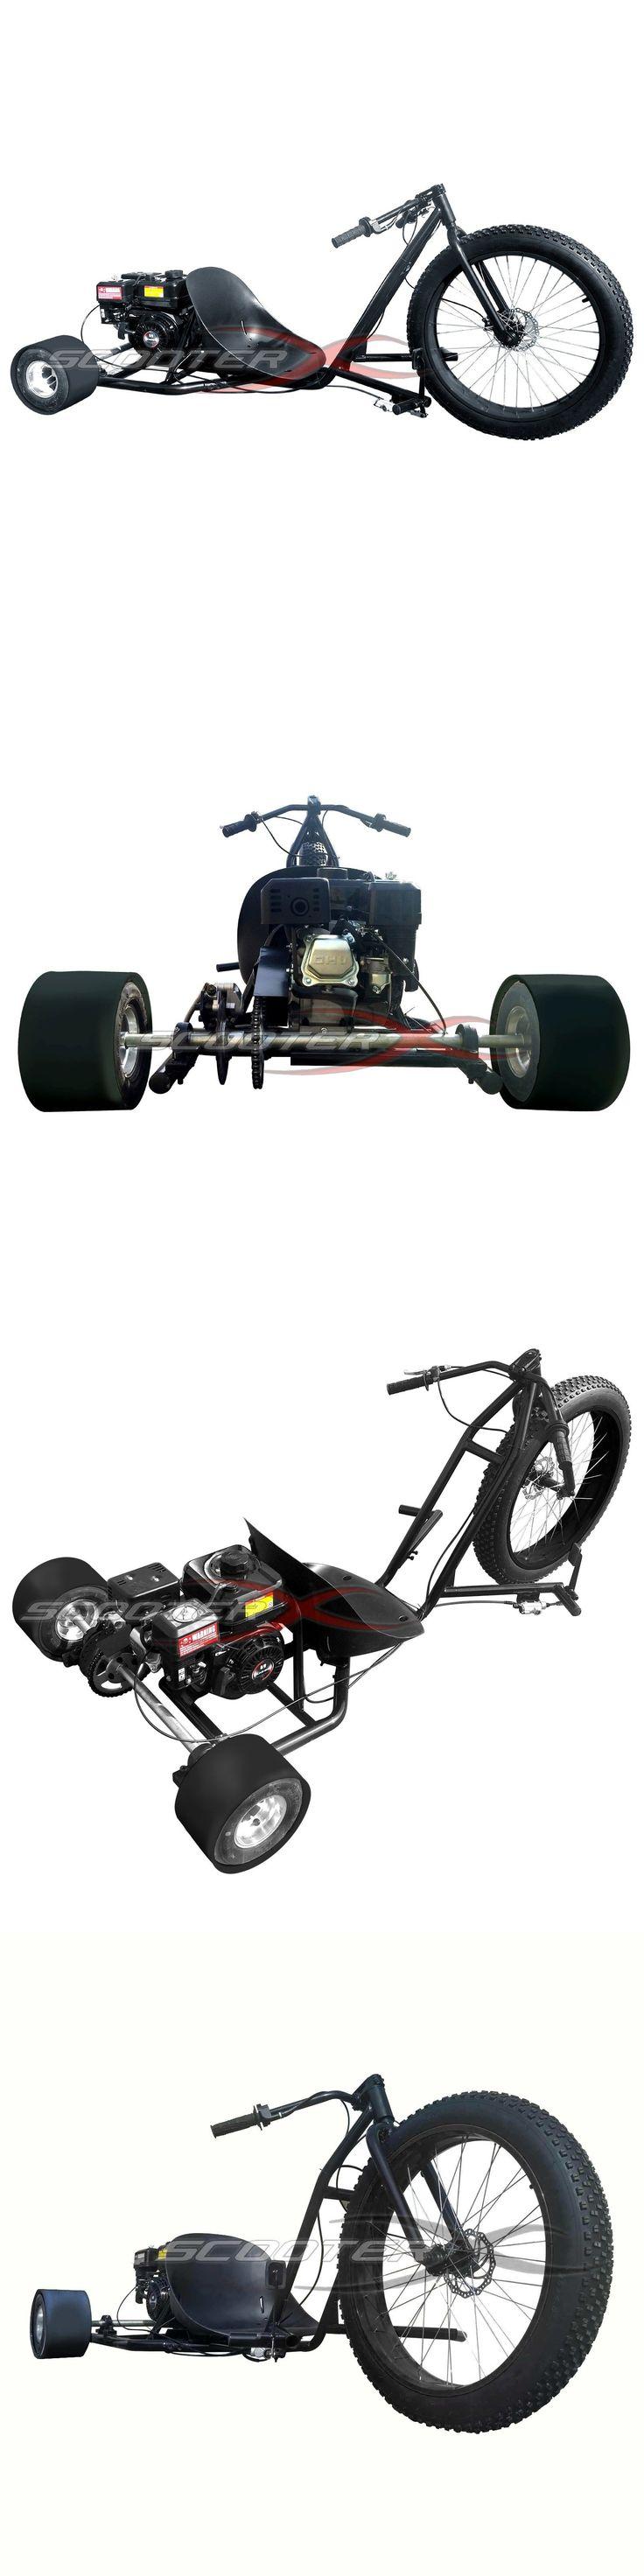 Gas Scooters 75211: Drift Trike Gas Powered 6.5Hp 3 Wheel Big Black Cart Go Kart Bike Motor Wheeler -> BUY IT NOW ONLY: $949 on eBay!